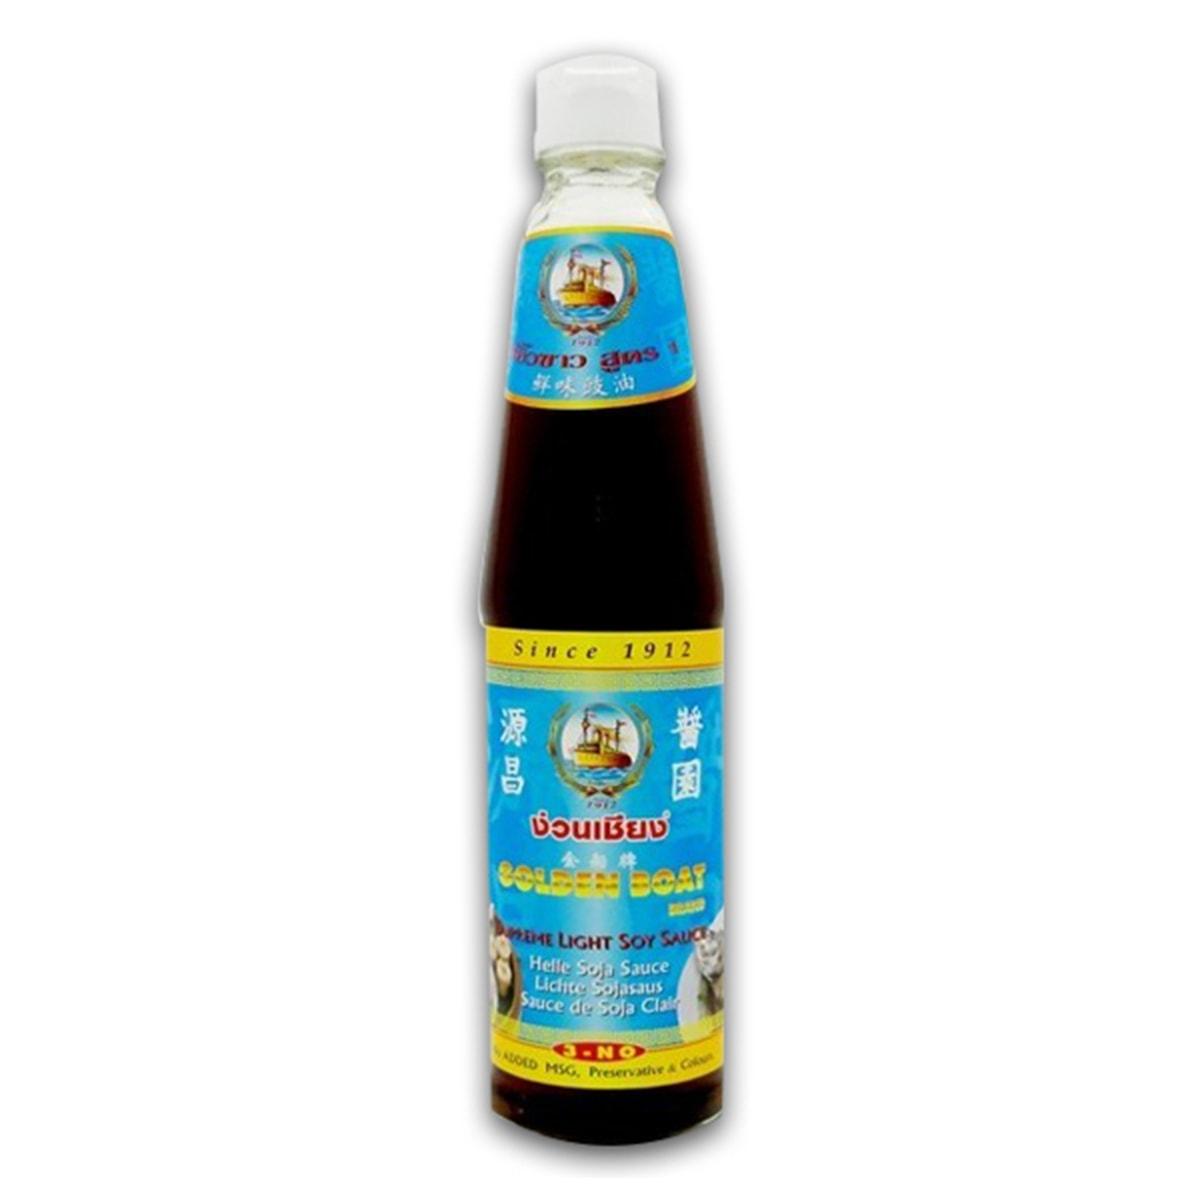 Buy Golden Boat Supreme Light Soy Sauce (Helle Soja Sauce) - 700 ml